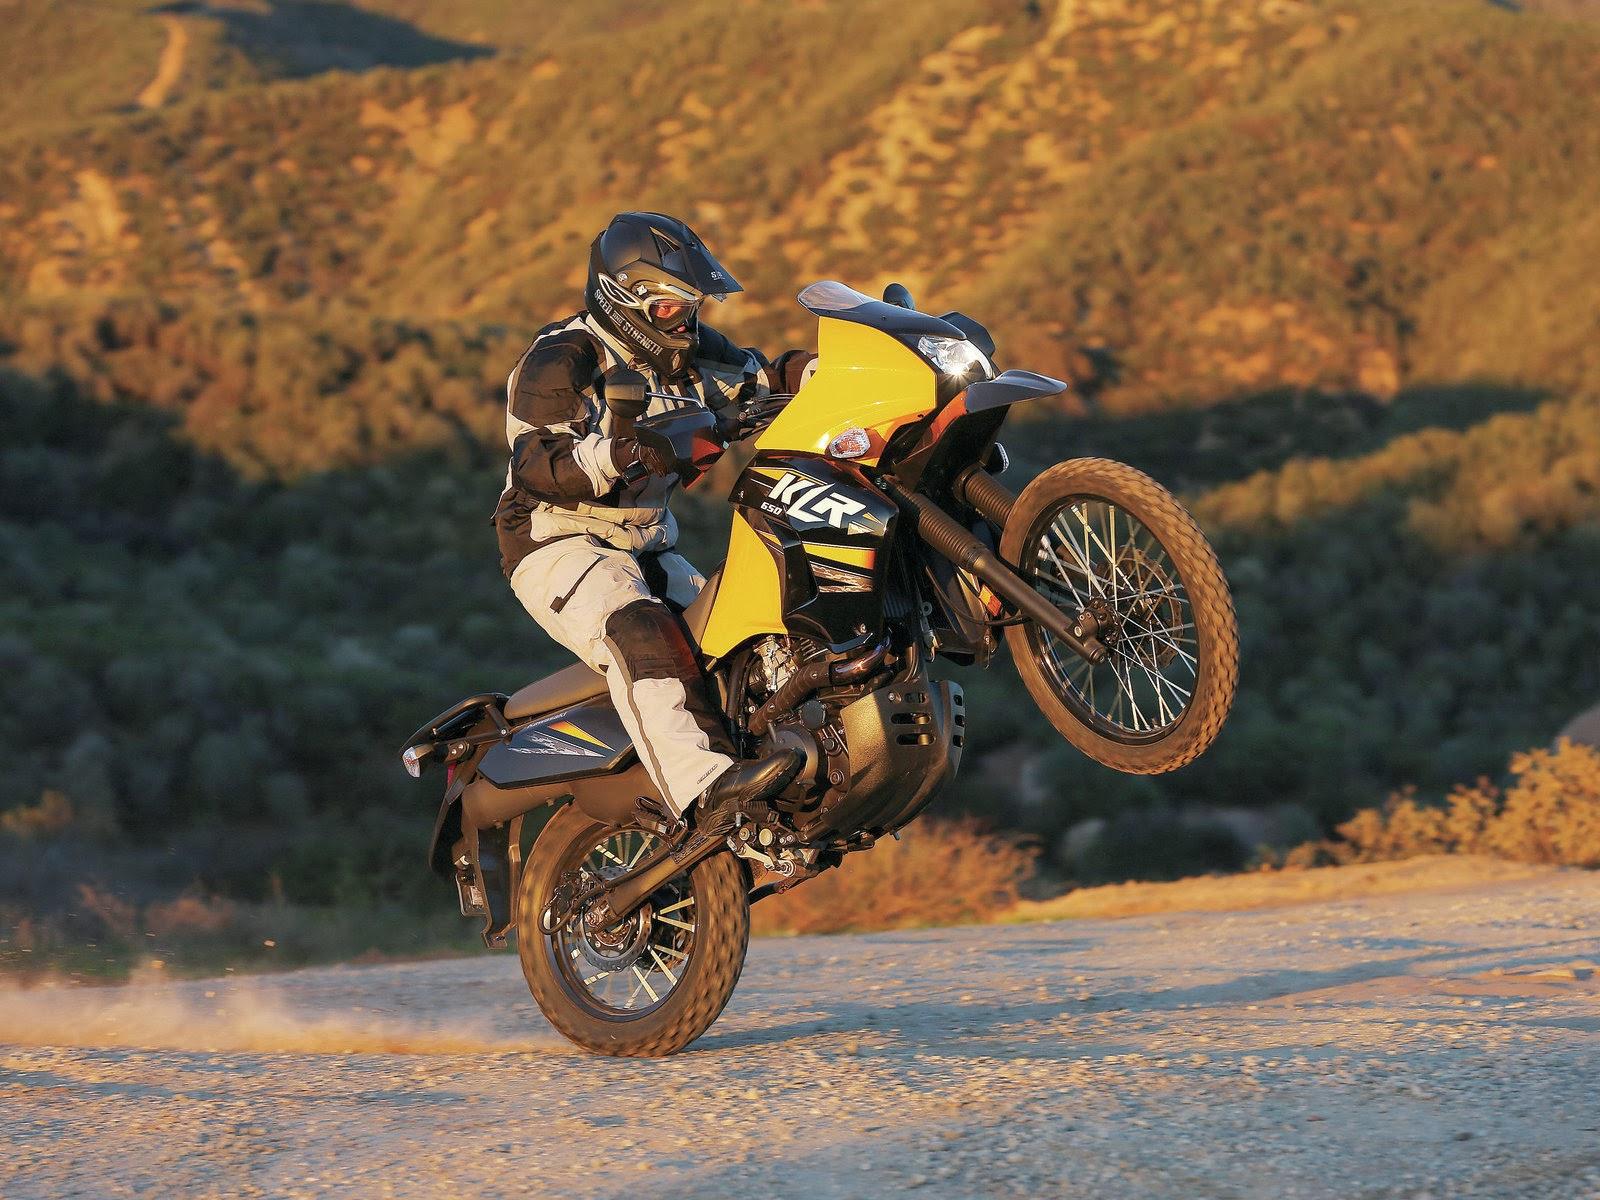 Bike Cars HD Wallpapers Kawasaki dual purpose Motorcycle 1600x1200